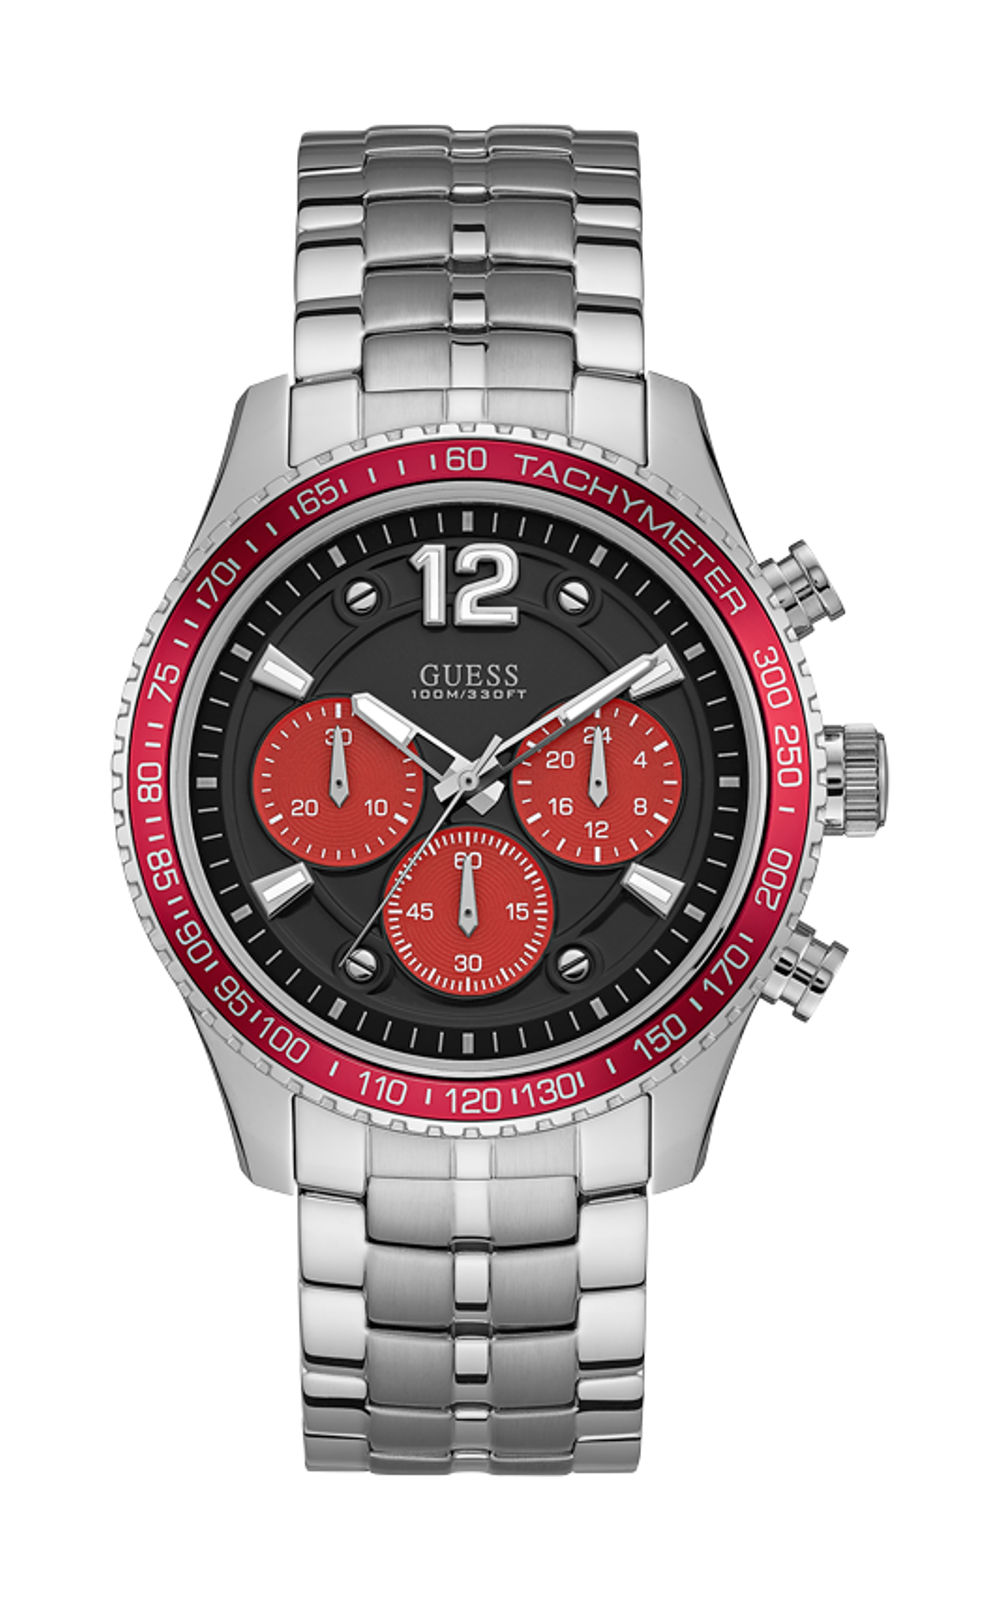 GUESS W0969G3 Ανδρικό Ρολόι Quartz Χρονογράφος Ακριβείας